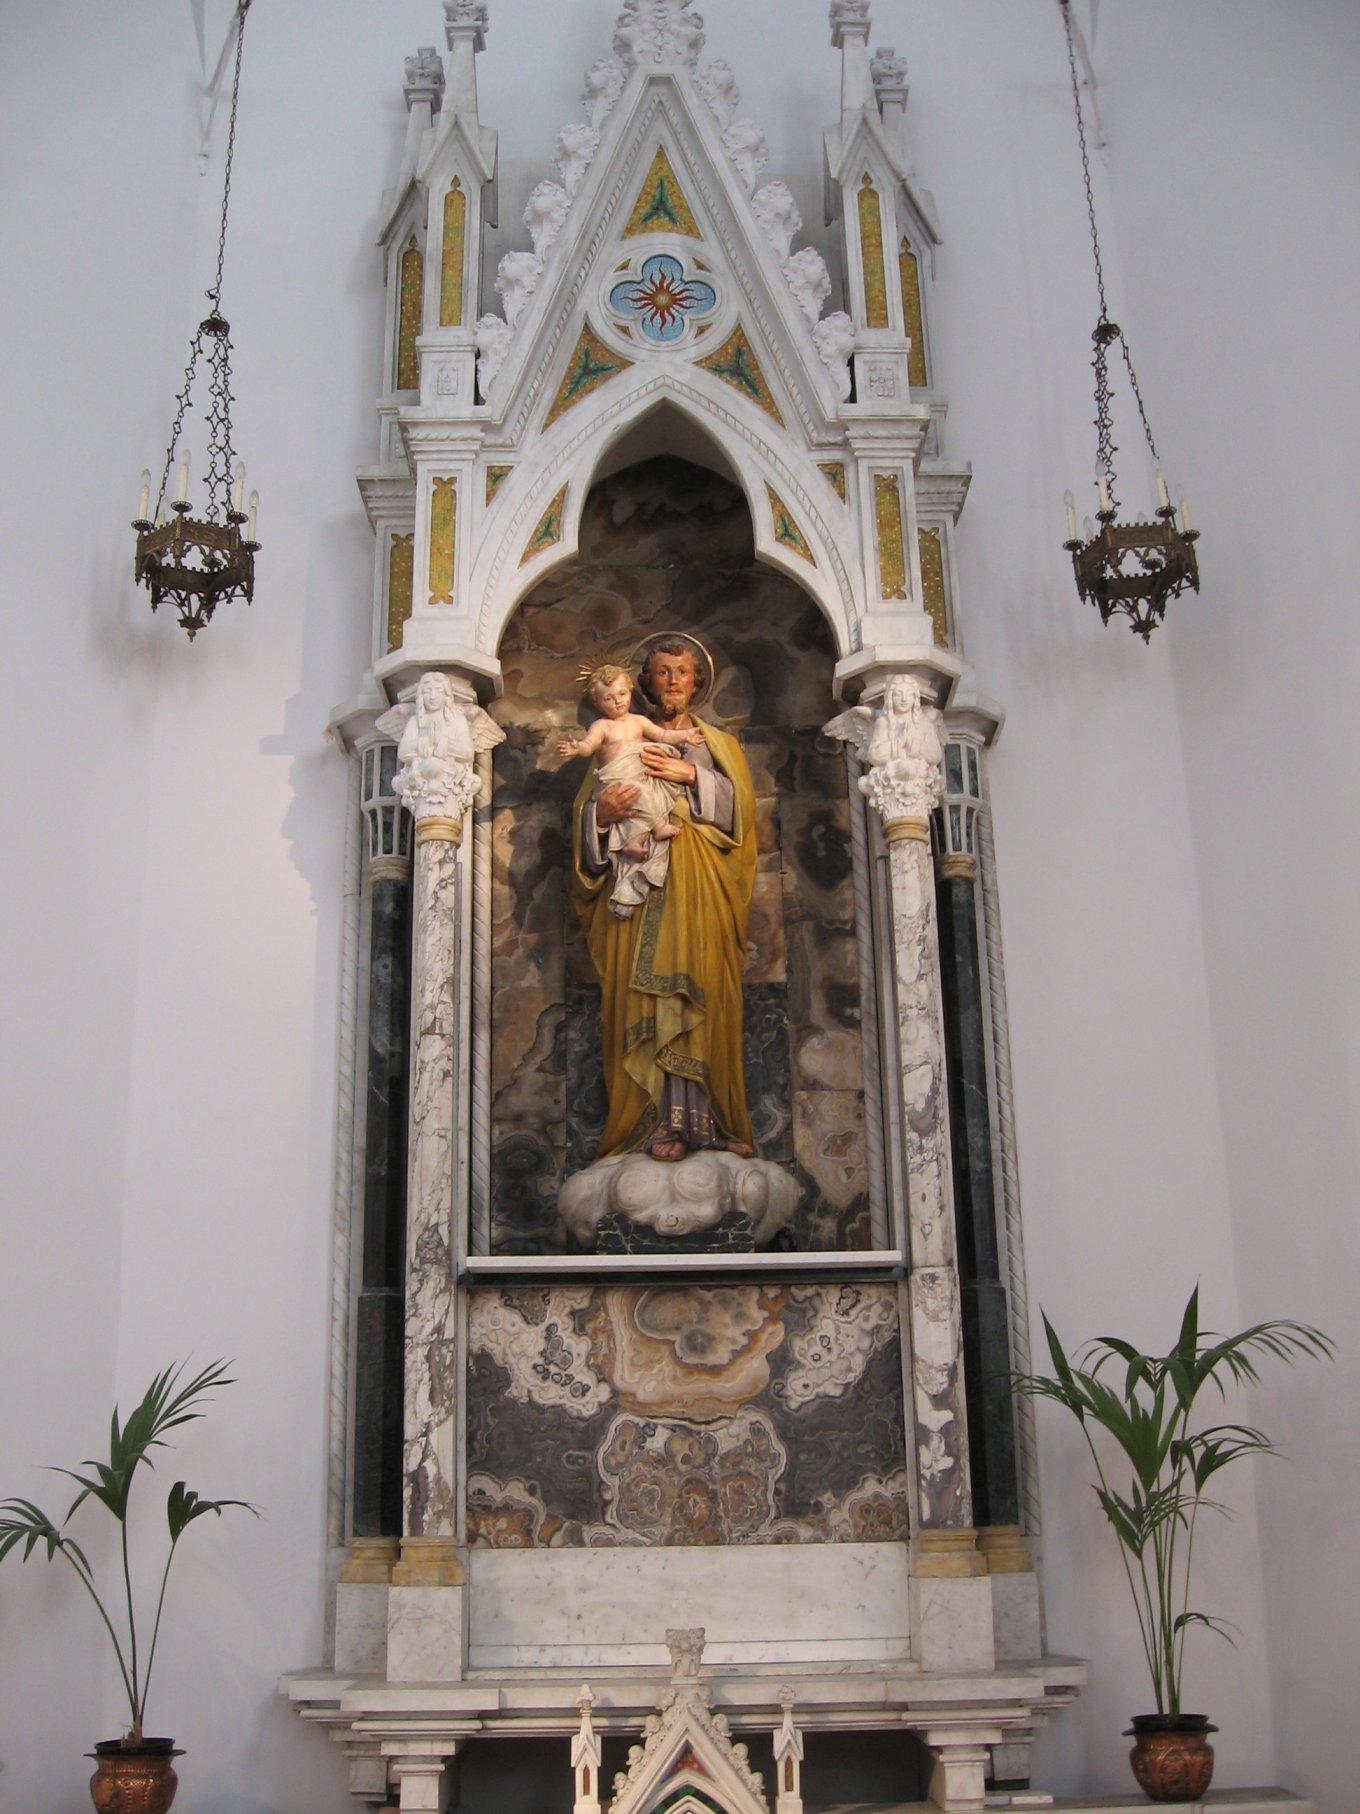 Chiesa_interno-2009-01-27-13.05.35.jpg